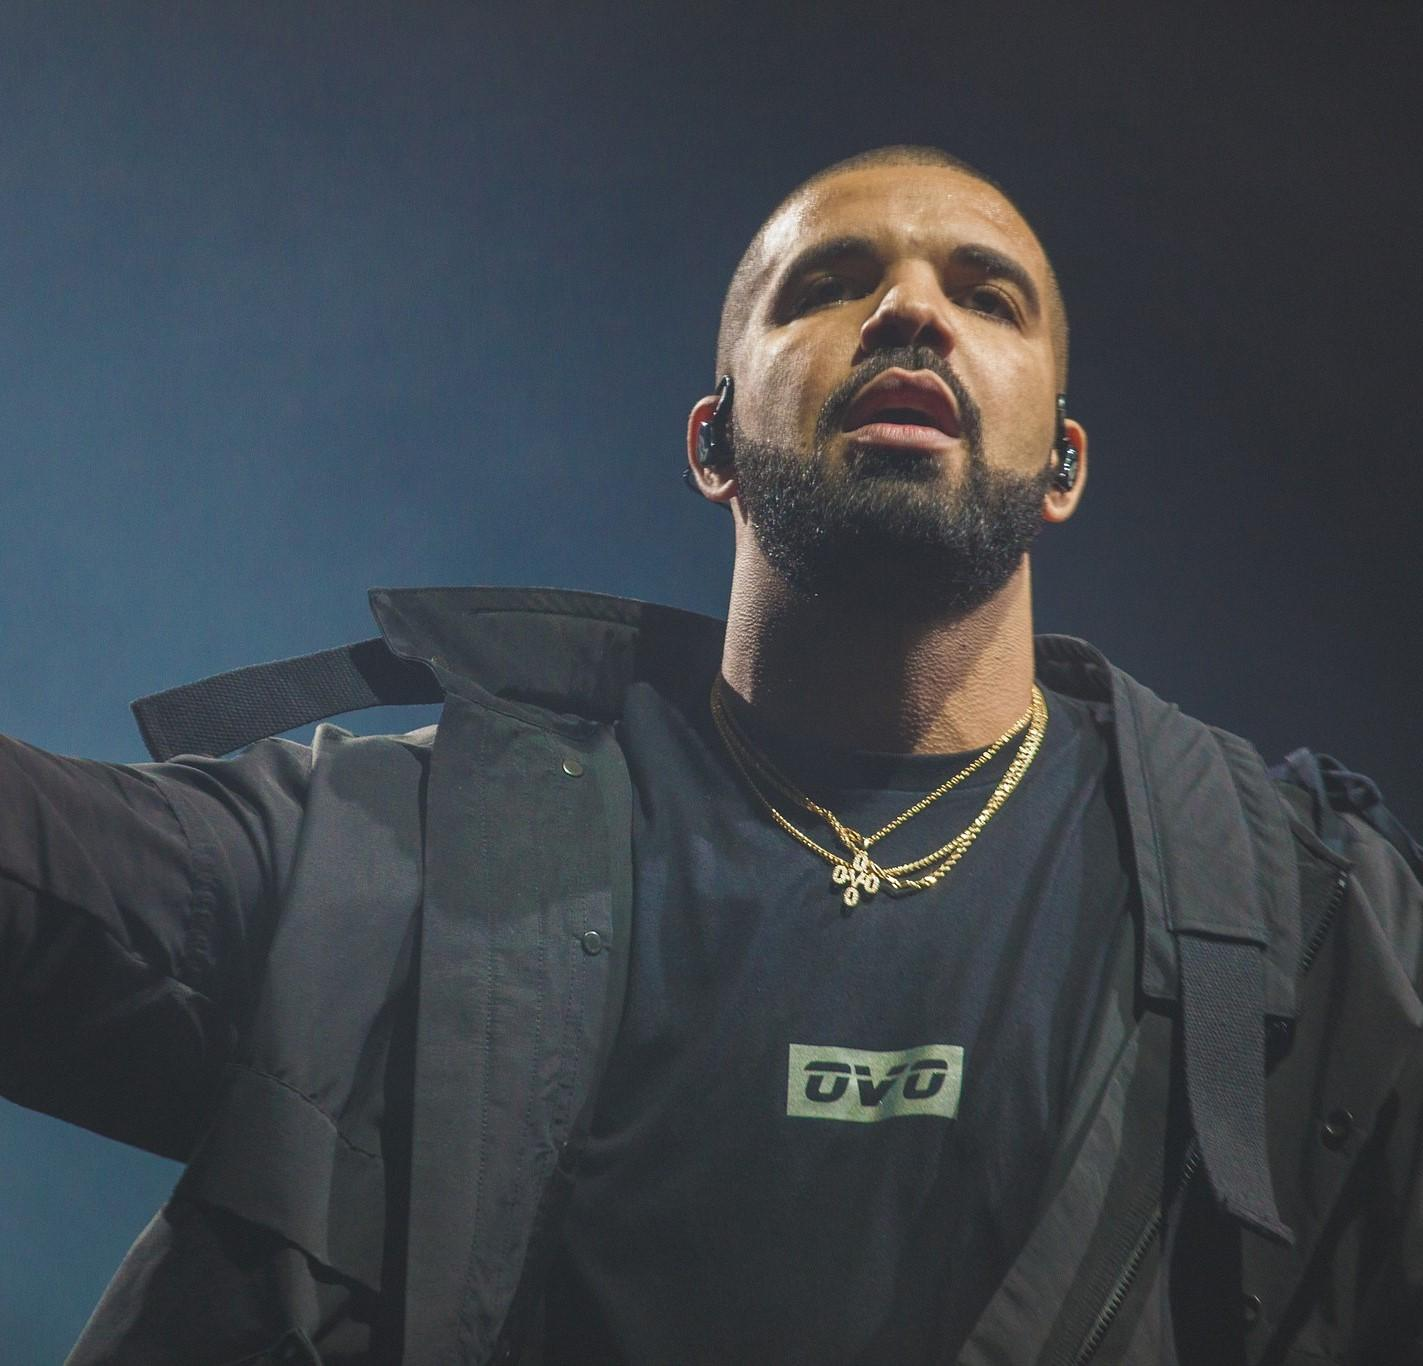 Drake performing during the 2016